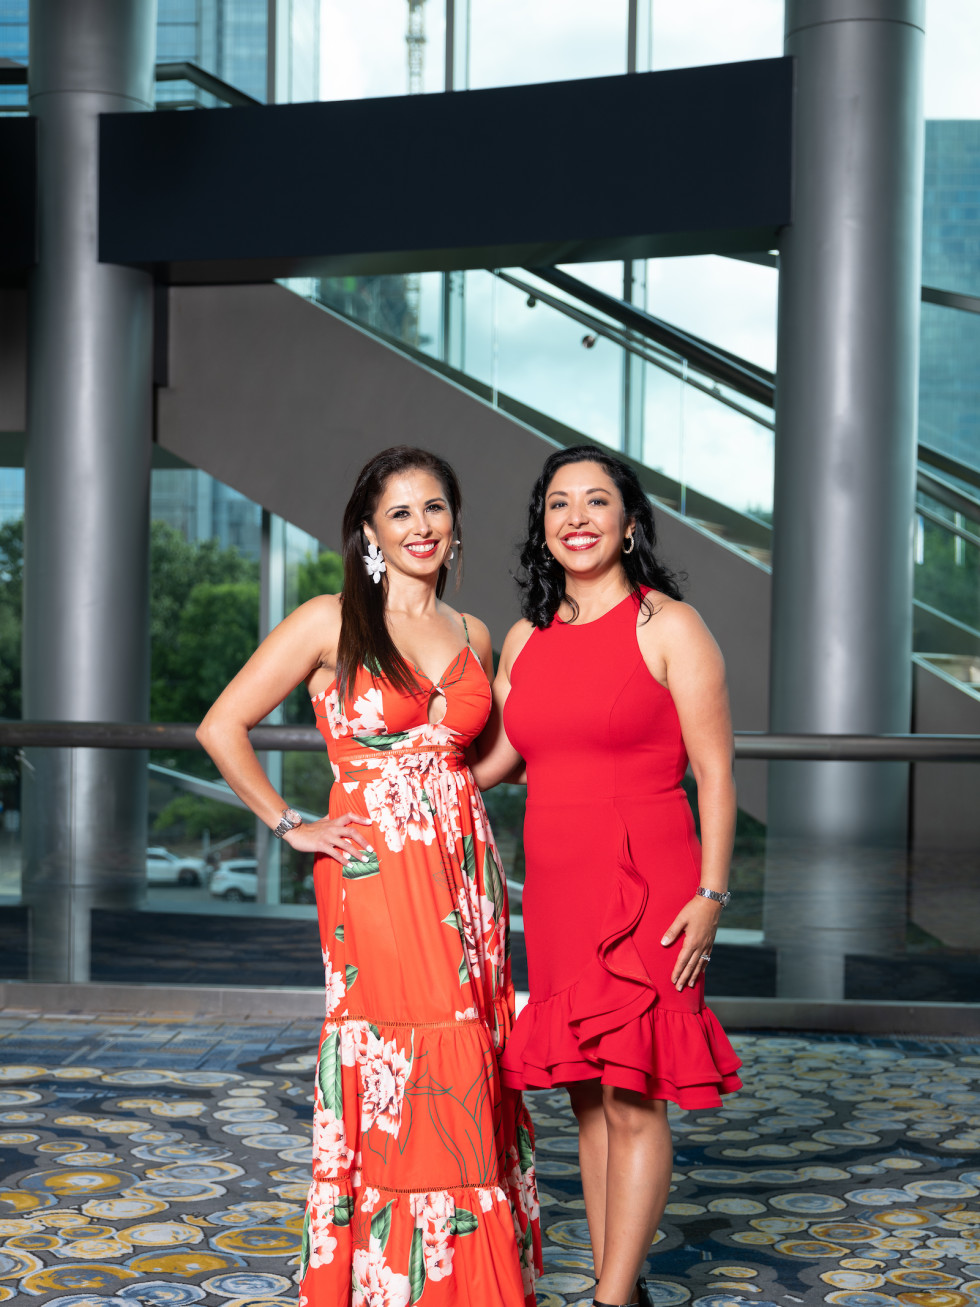 LWI Houston 2021 fashion show luncheon Laura Salinas-Pruneda and Monica Casiano